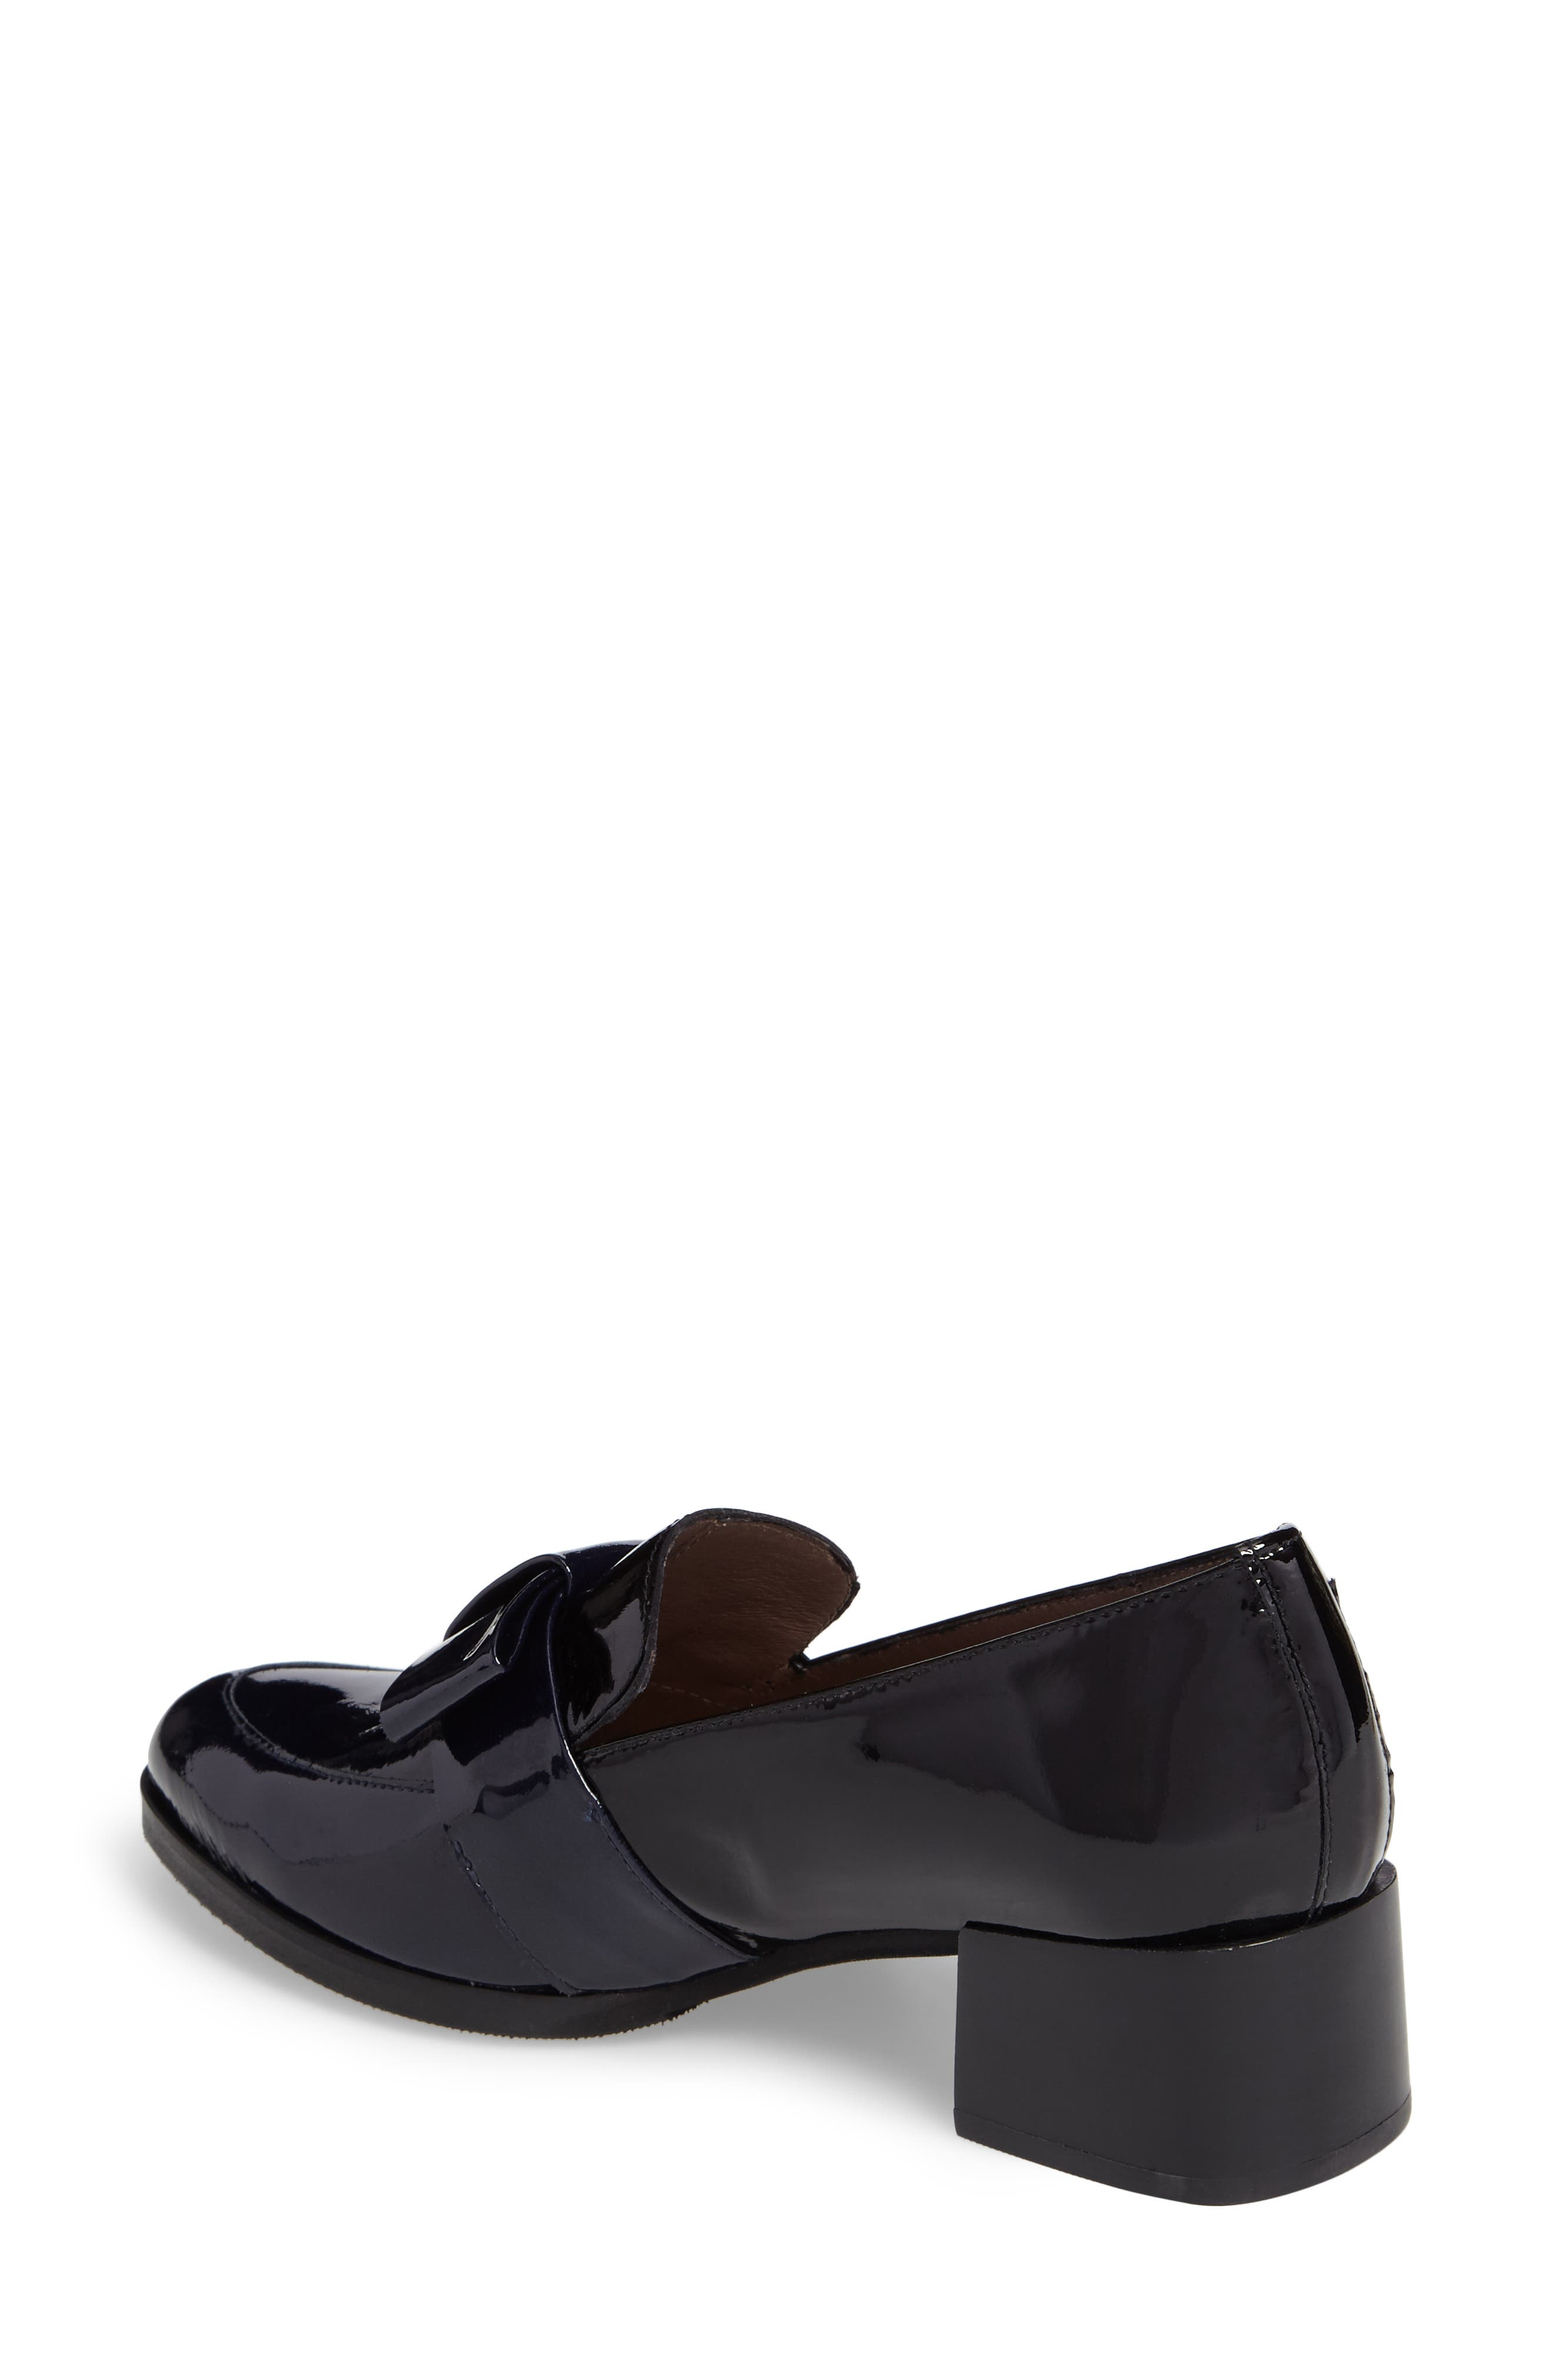 Block Heel Loafer Pump,                             Alternate thumbnail 2, color,                             Navy/ Black Patent Leather